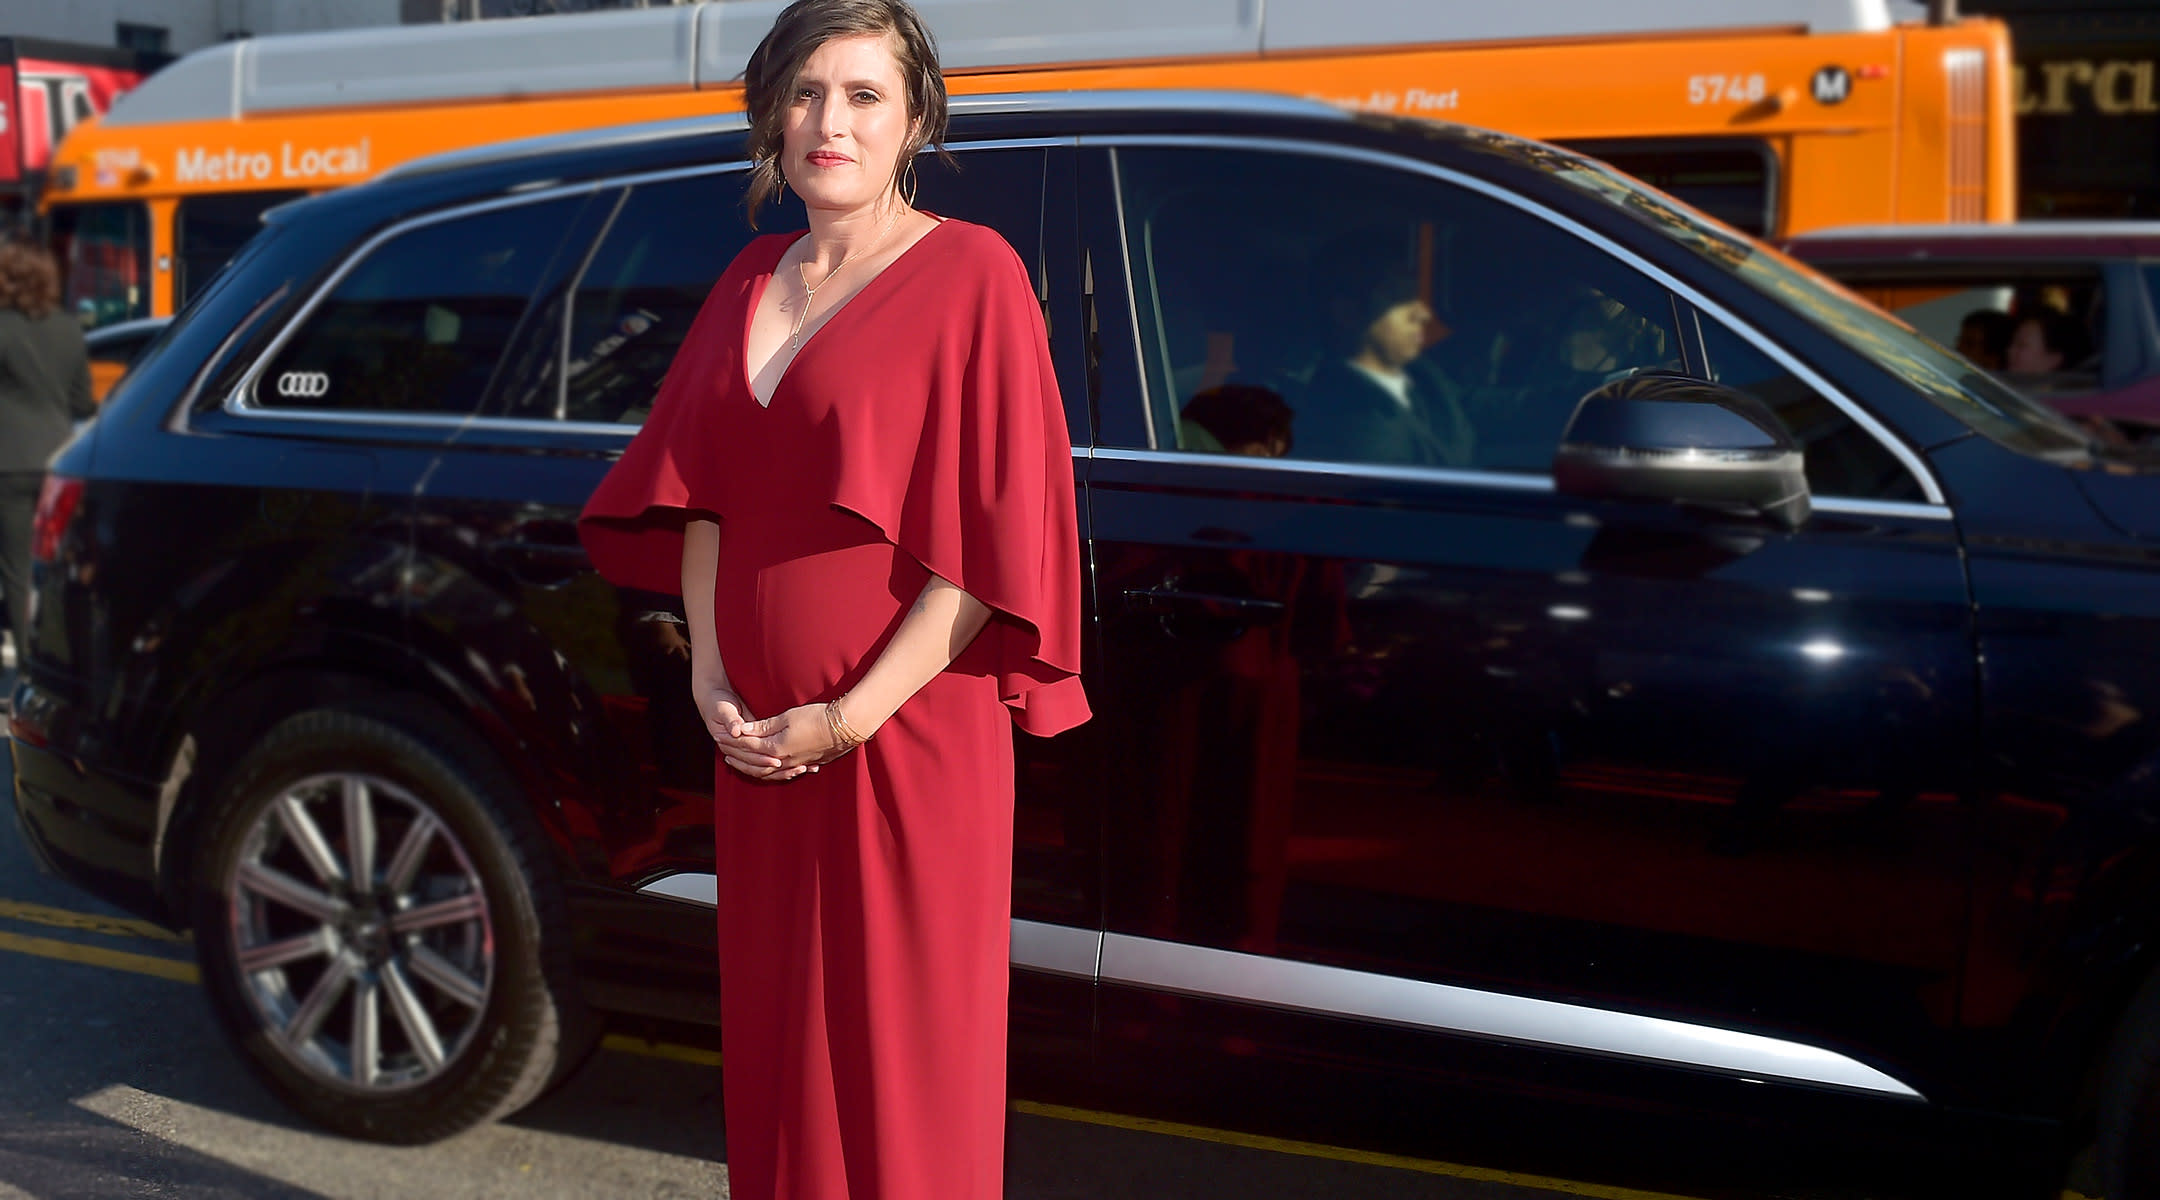 film maker Rachel Morrison defends working pregnant women